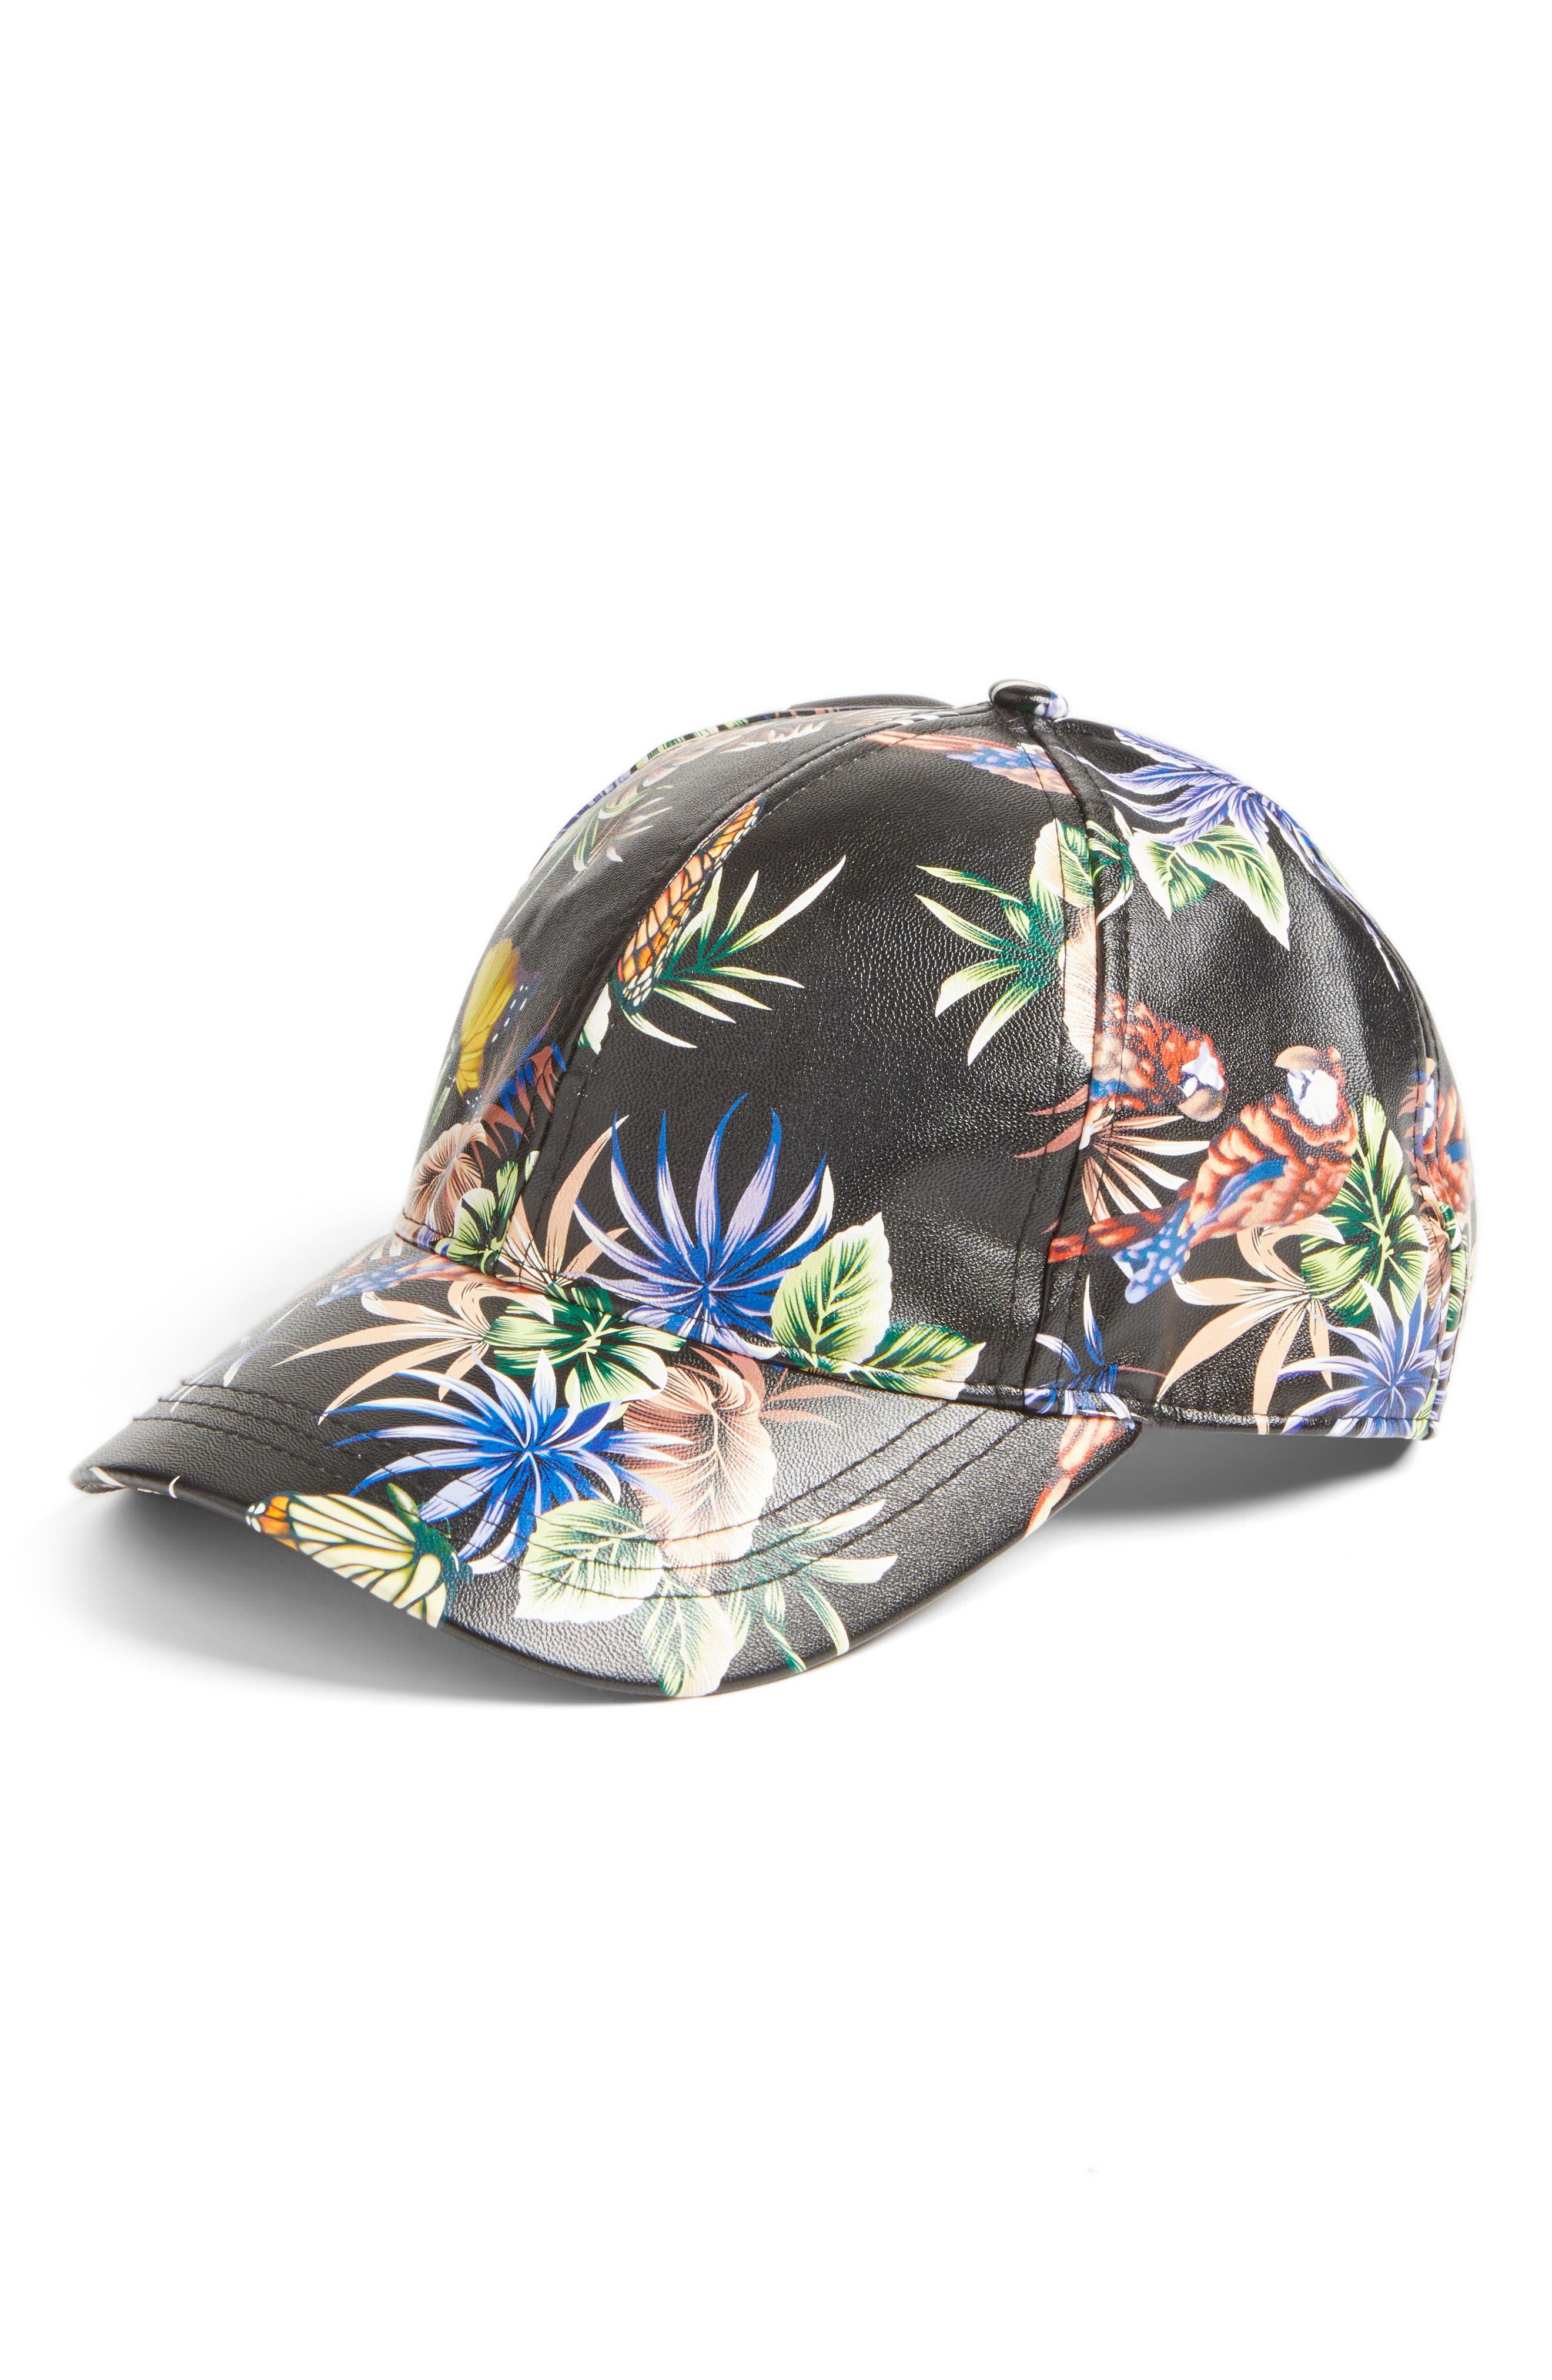 August Hat Floral Faux Leather Baseball Cap